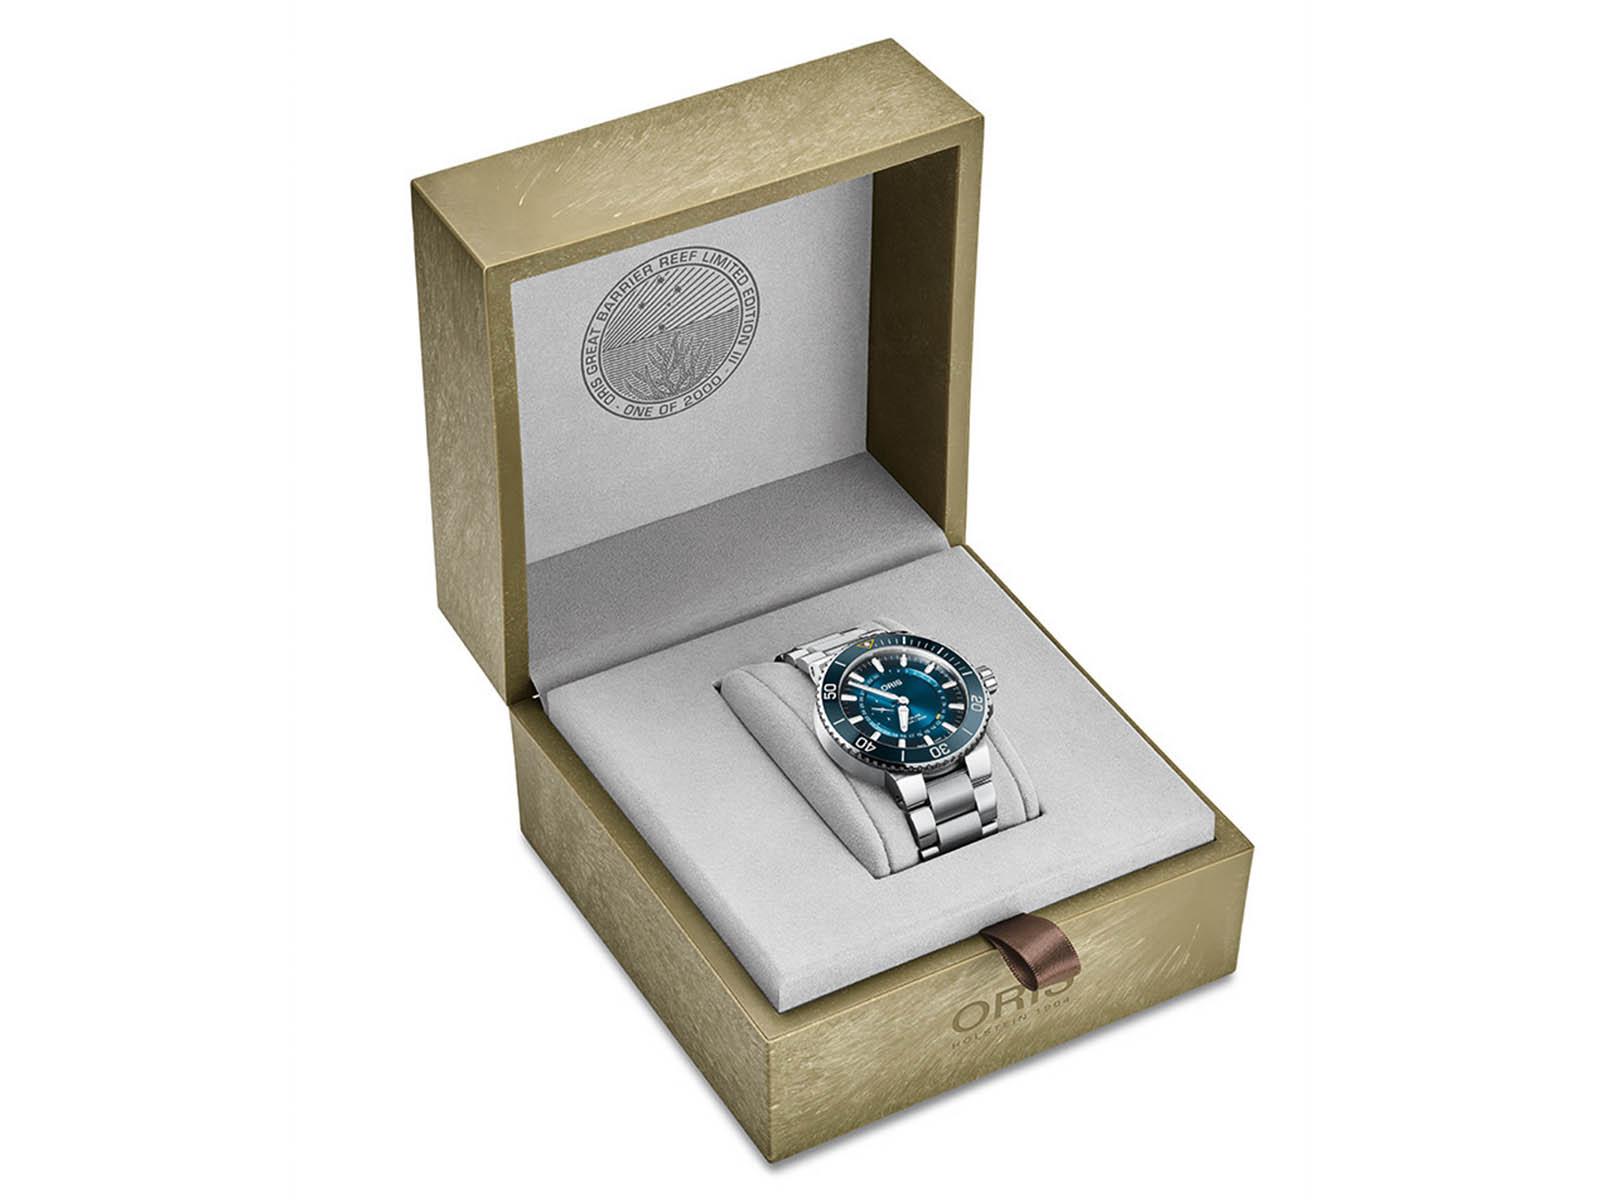 01-743-7734-4185-set-oris-great-barrier-reef-limited-edition-3.jpg